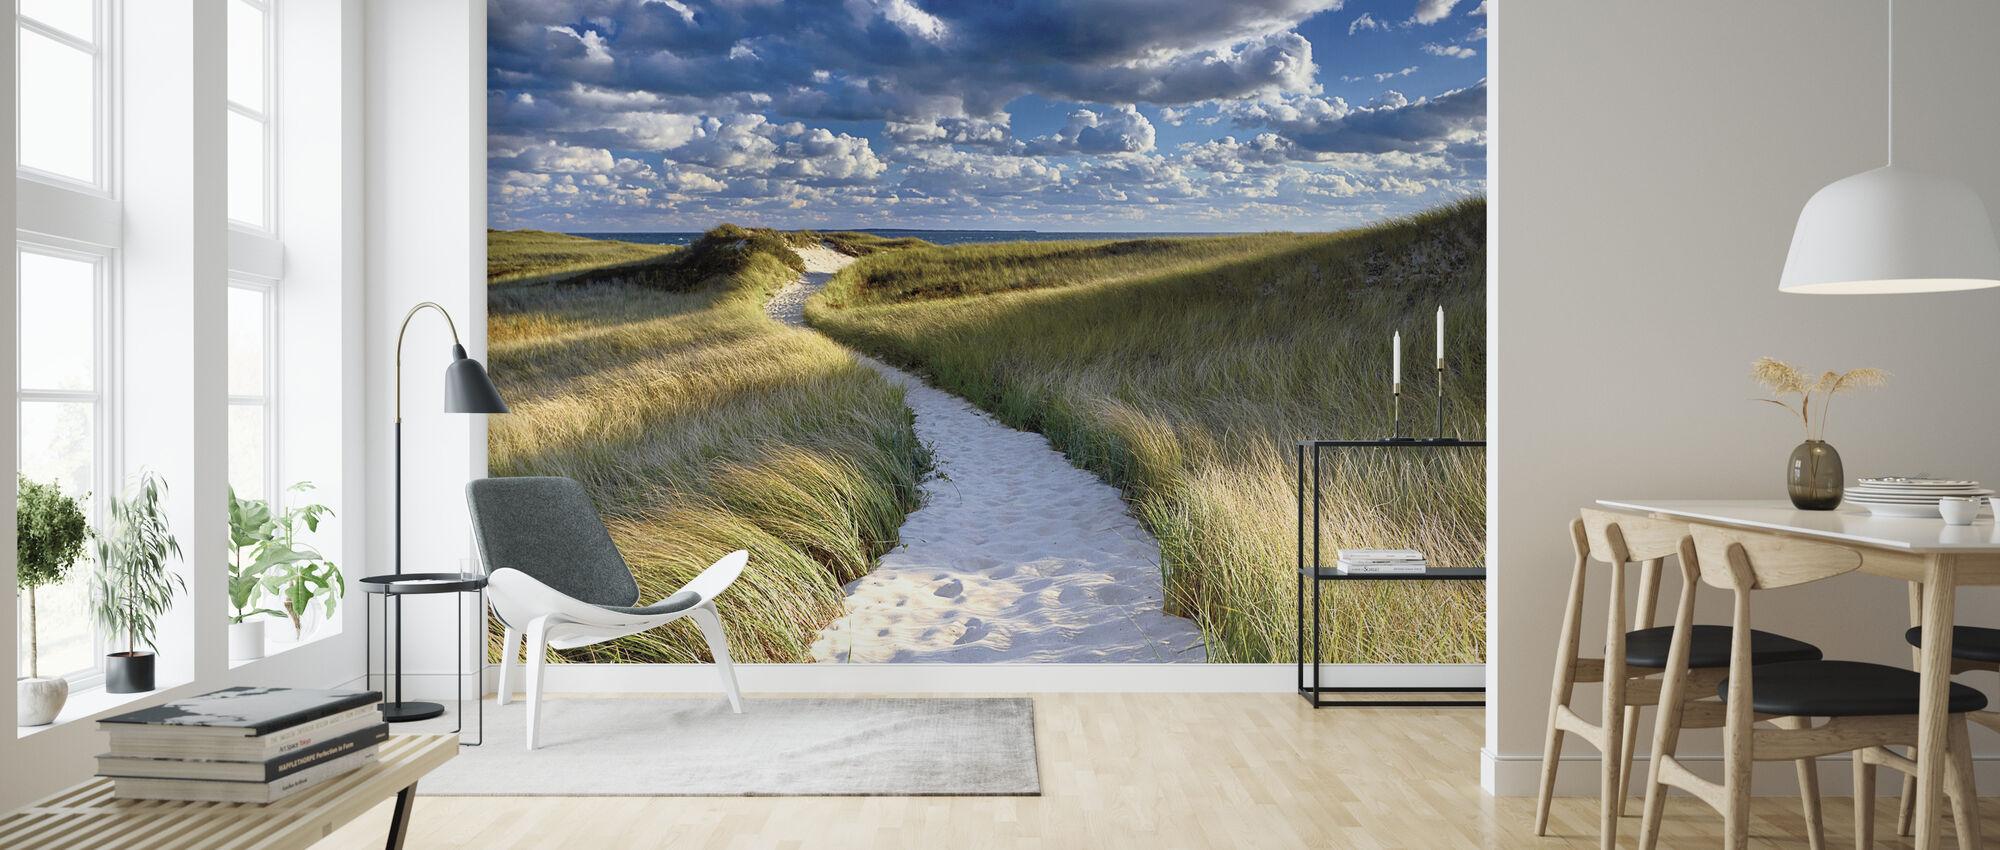 Philbin ranta - Tapetti - Olohuone